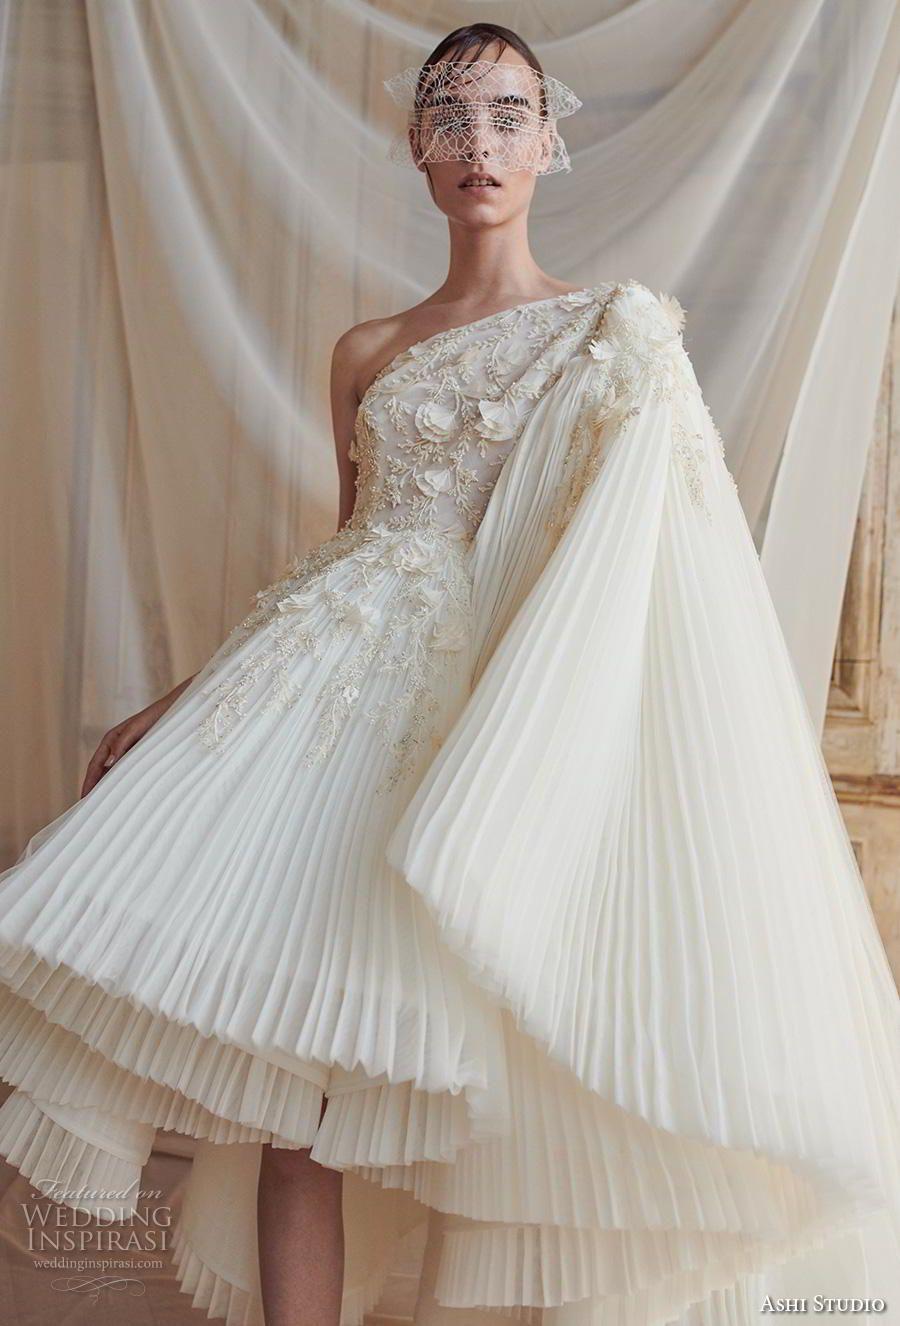 Ashi Studio Fall Winter 2018 2019 Couture Collection Wedding Inspirasi Short Wedding Dress Bridal Couture Bridal Dresses